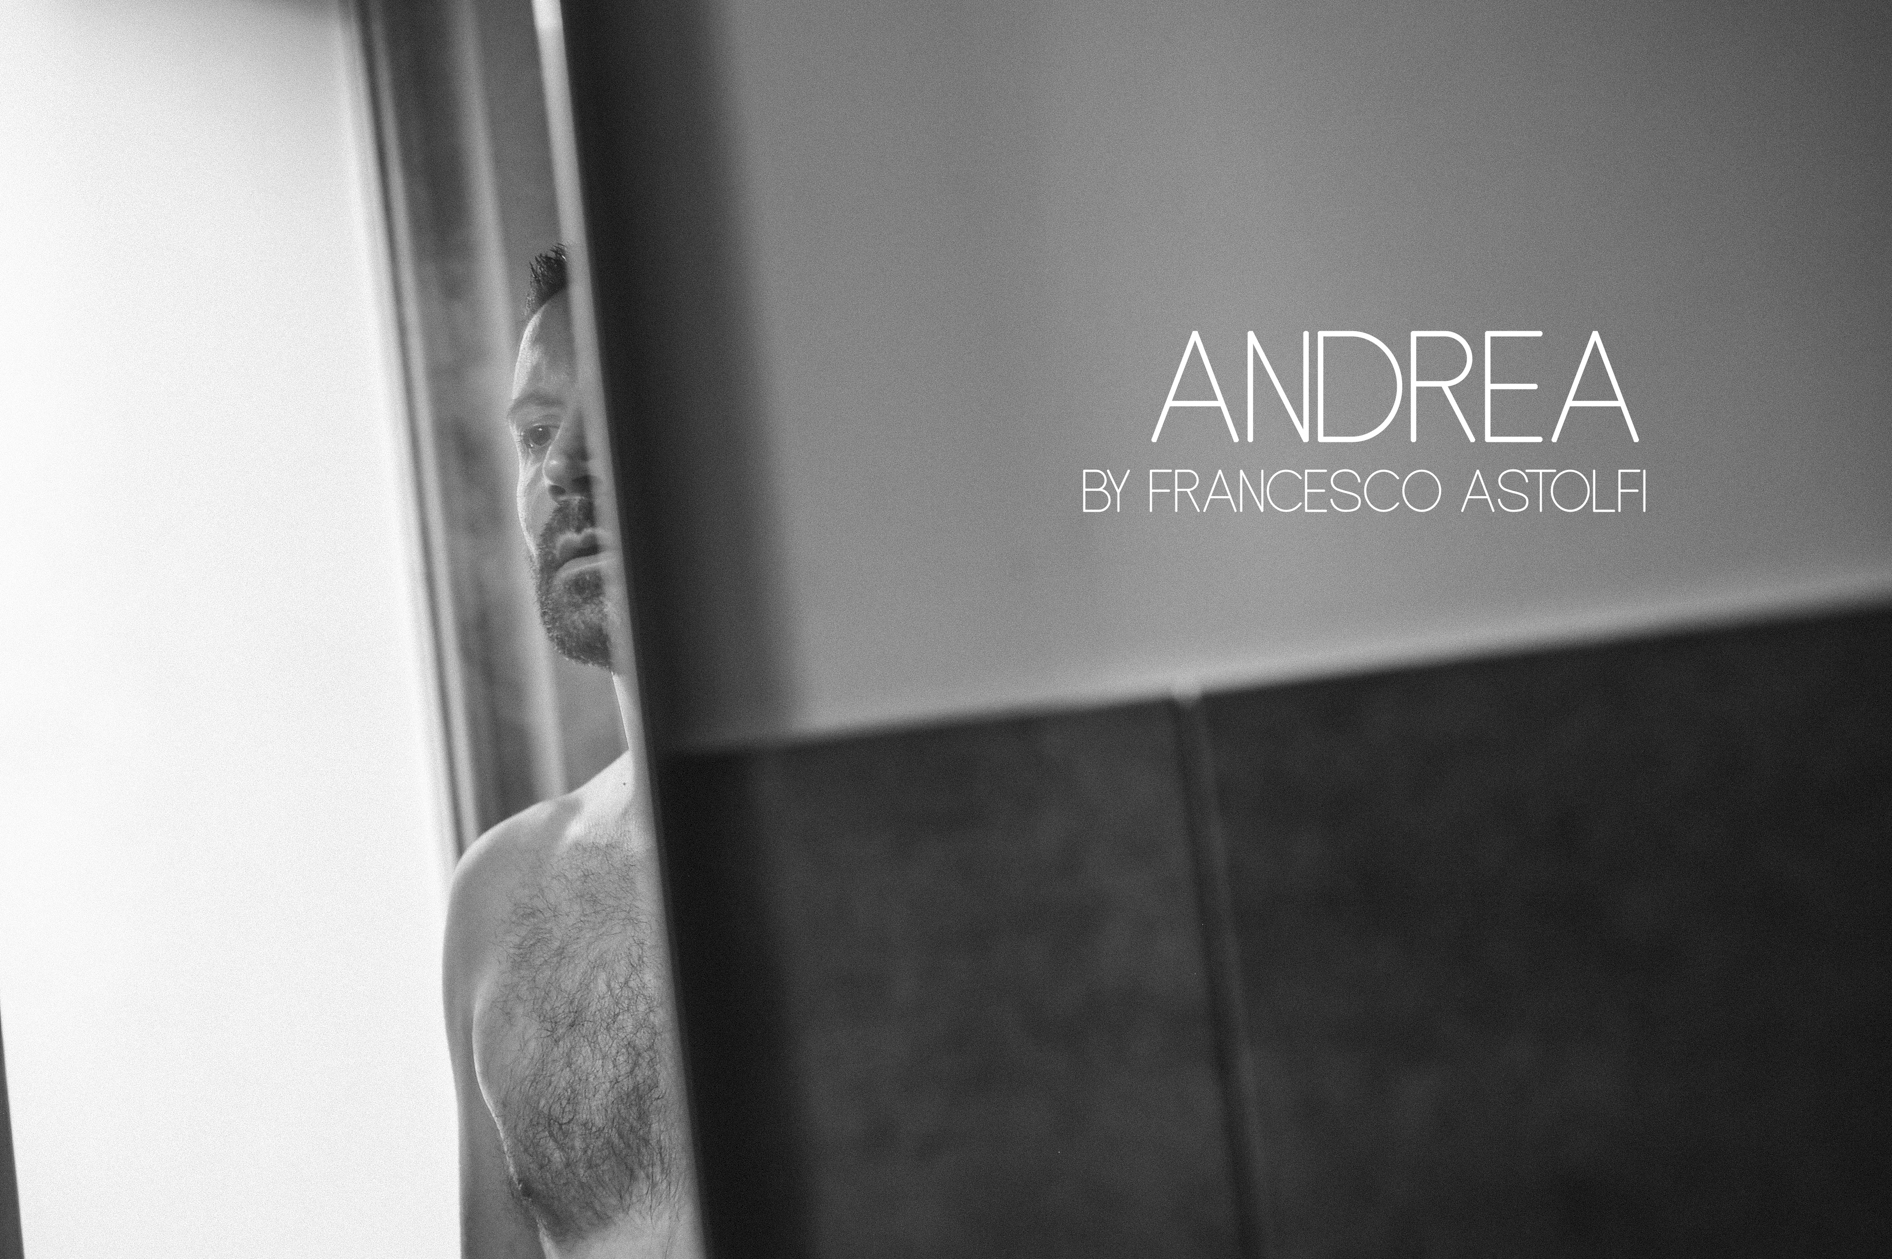 001 - ANDREA S. - Photo by Francesco Astolfi